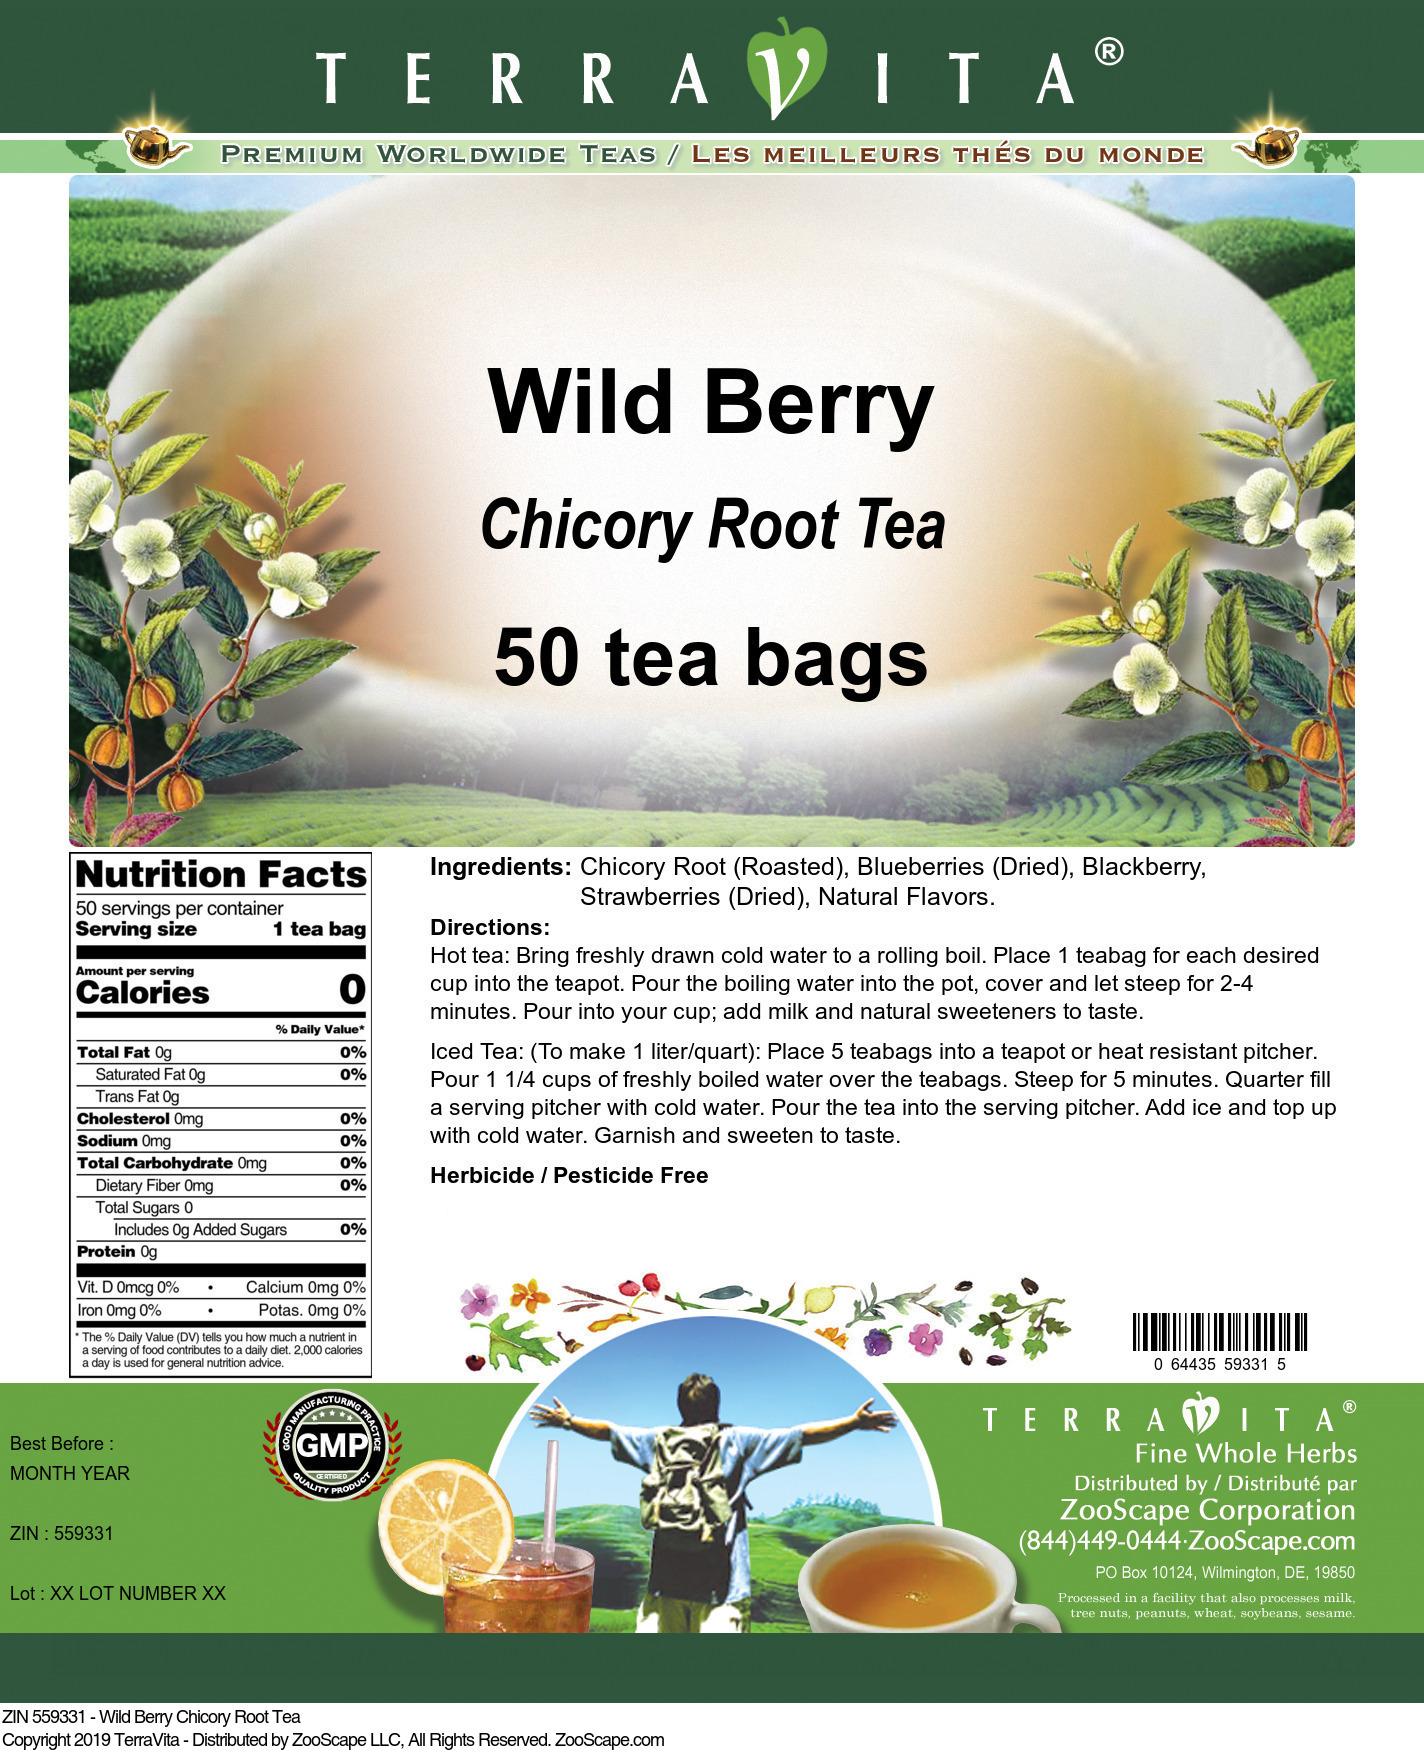 Wild Berry Chicory Root Tea